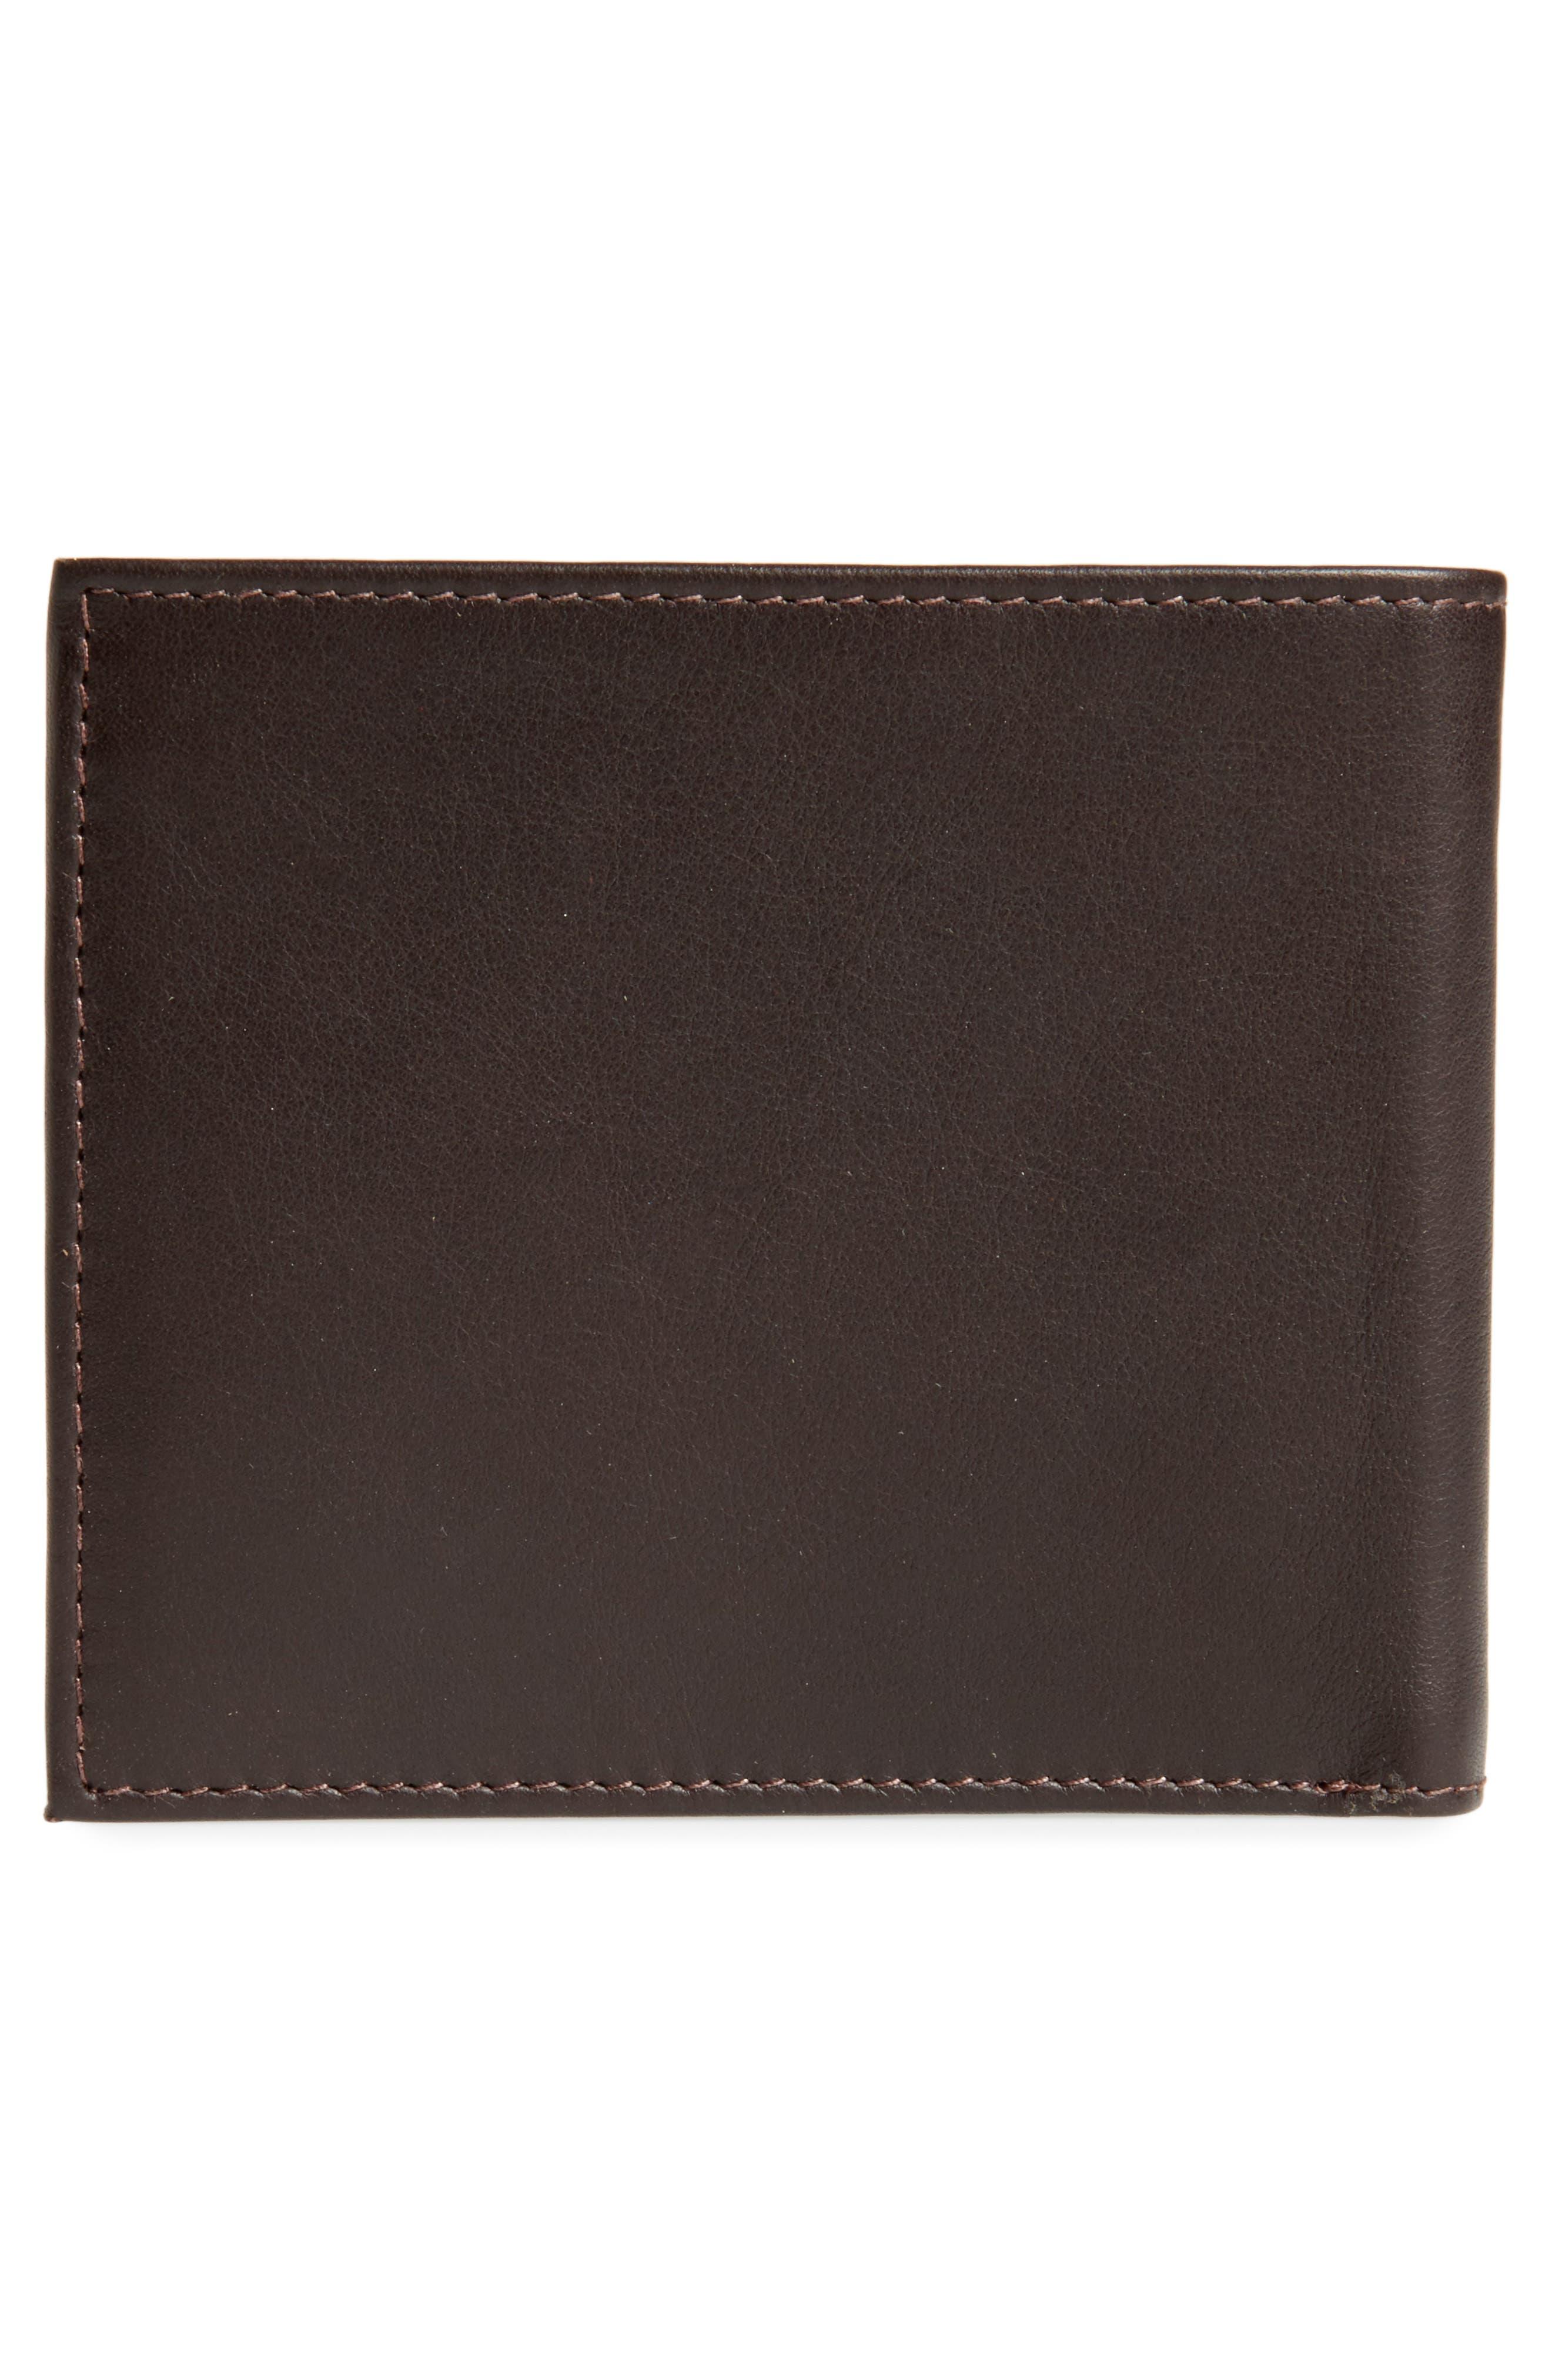 Bourbon Stripe Leather Billfold,                             Alternate thumbnail 3, color,                             Chocolate